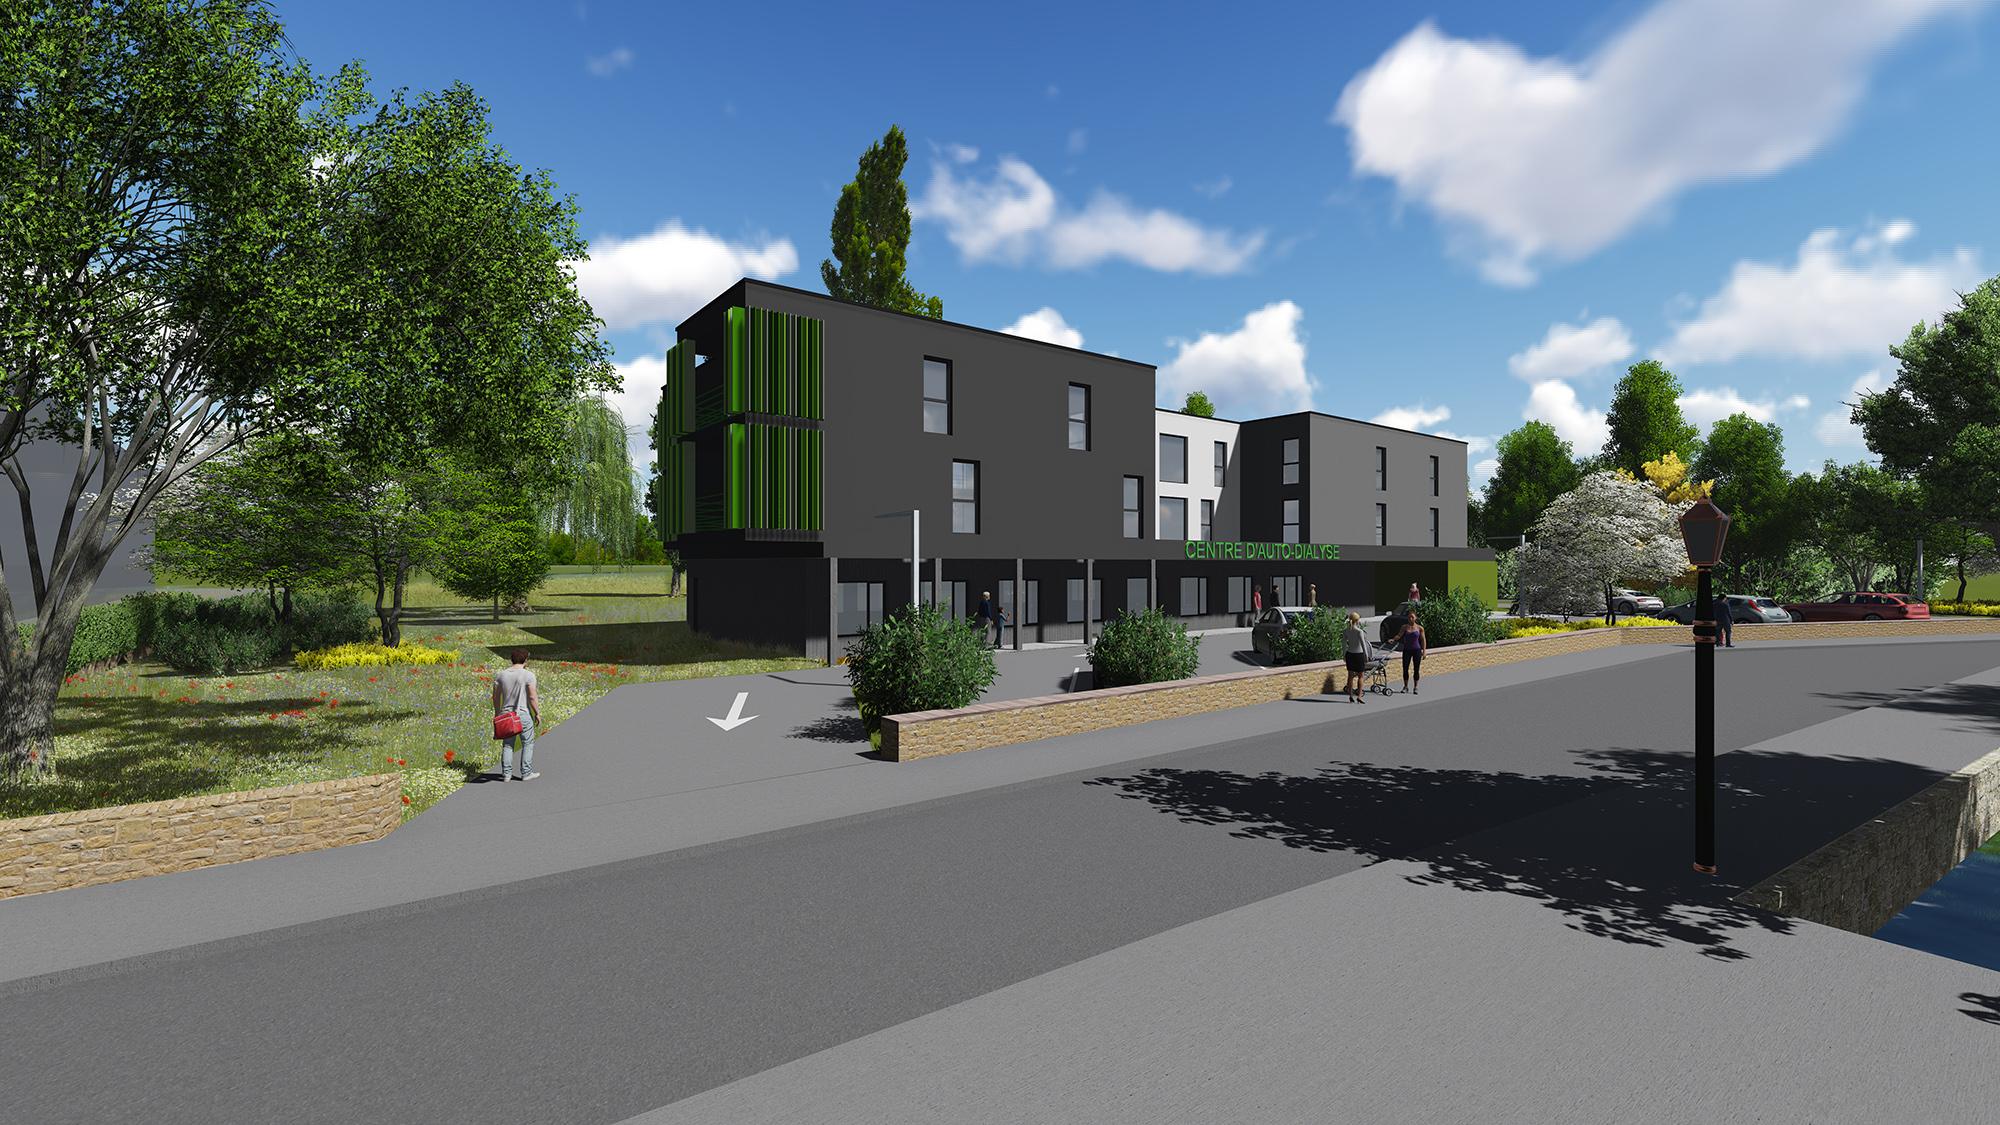 Chouette-architecture-Centre-dauto-dialyse-12-logements-Orvitis-Beaune-1